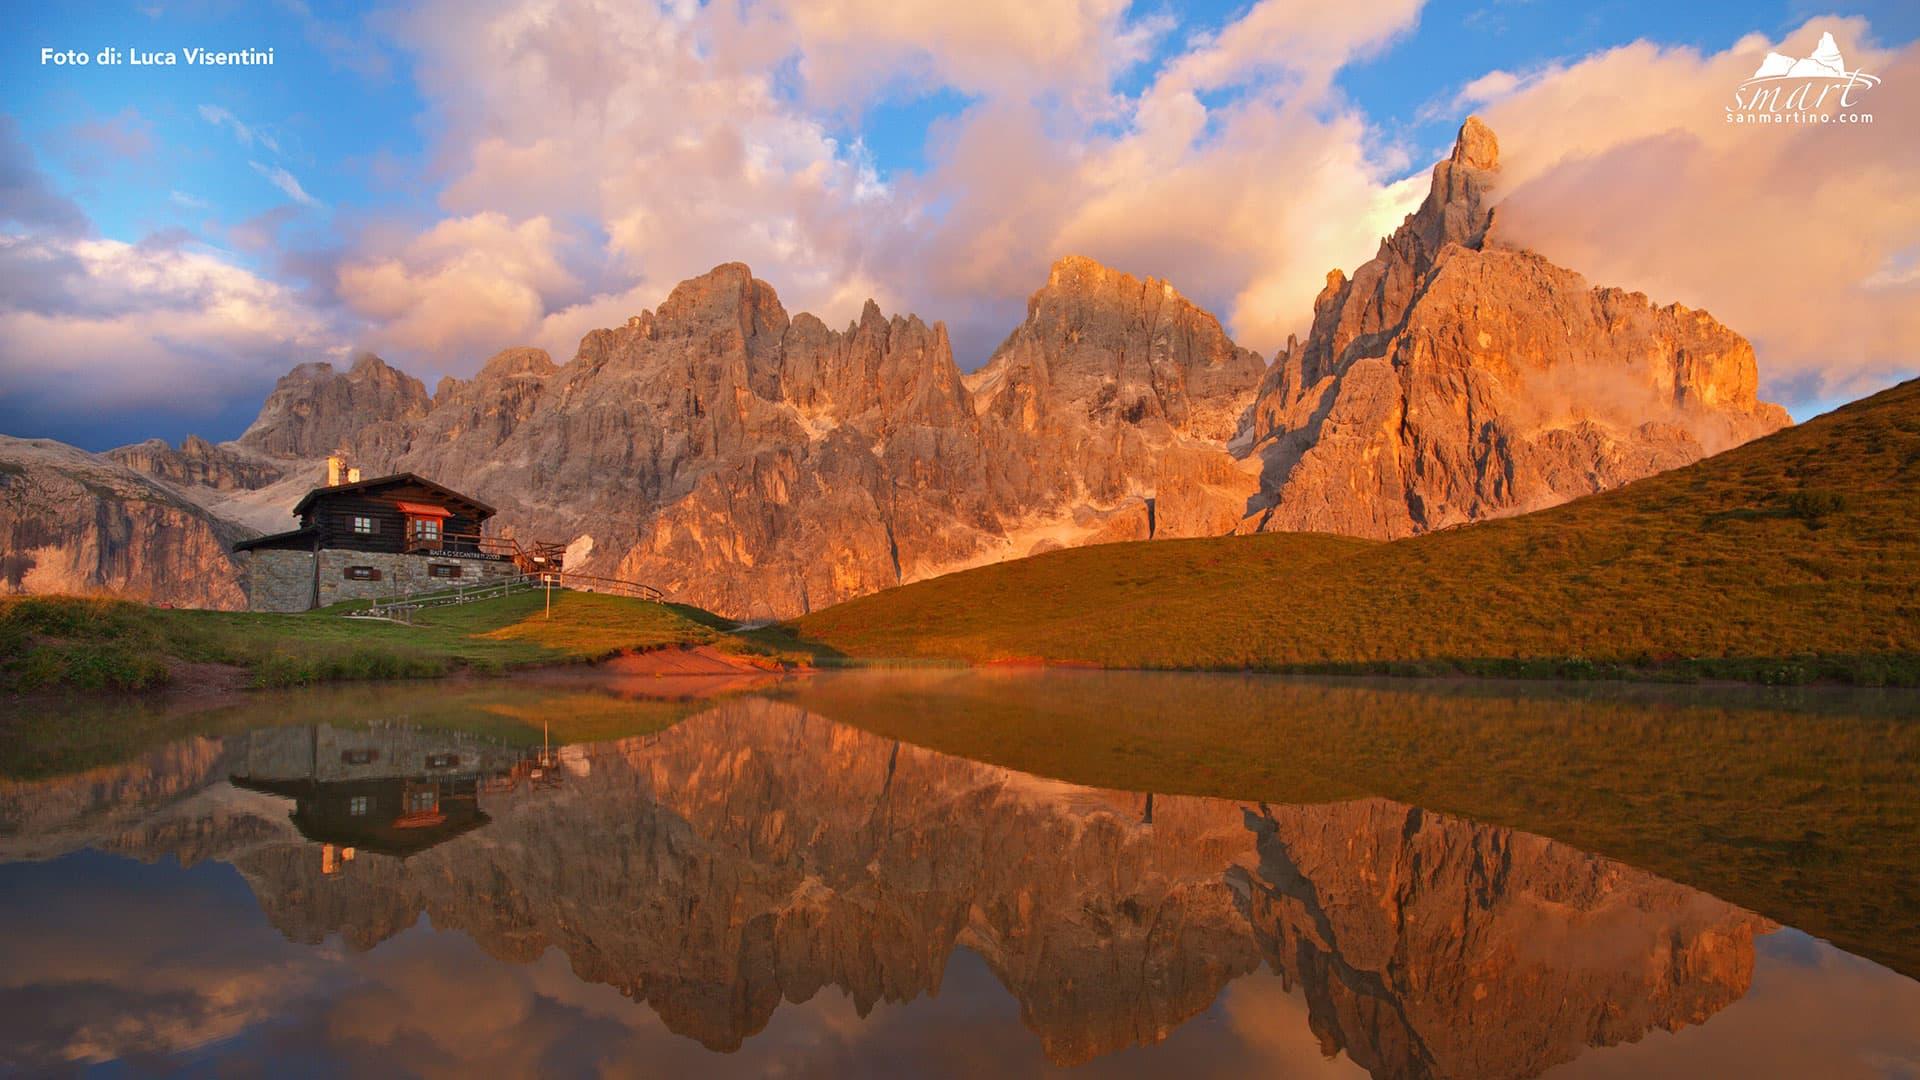 Baita Segantini Dolomiti